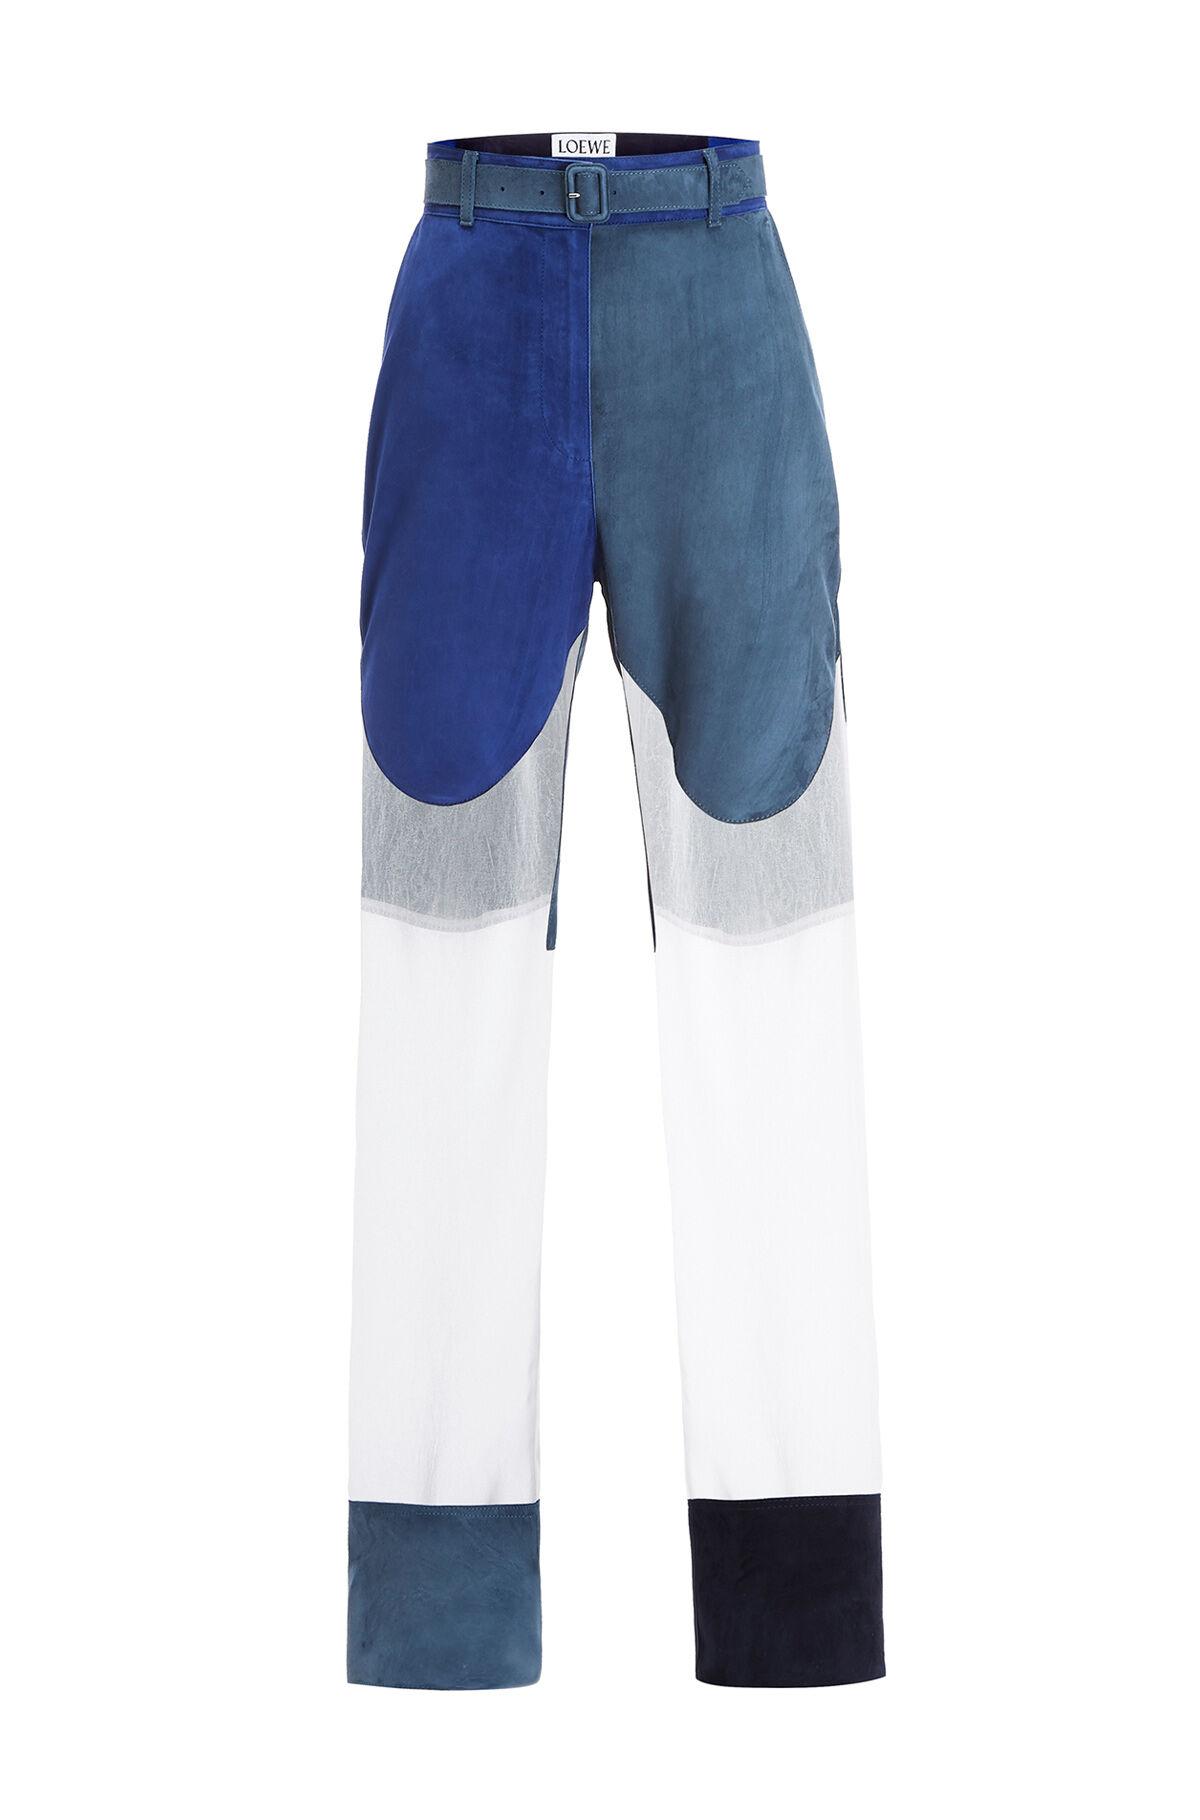 LOEWE Trousrs Suede Panels & Textile Blue/White front